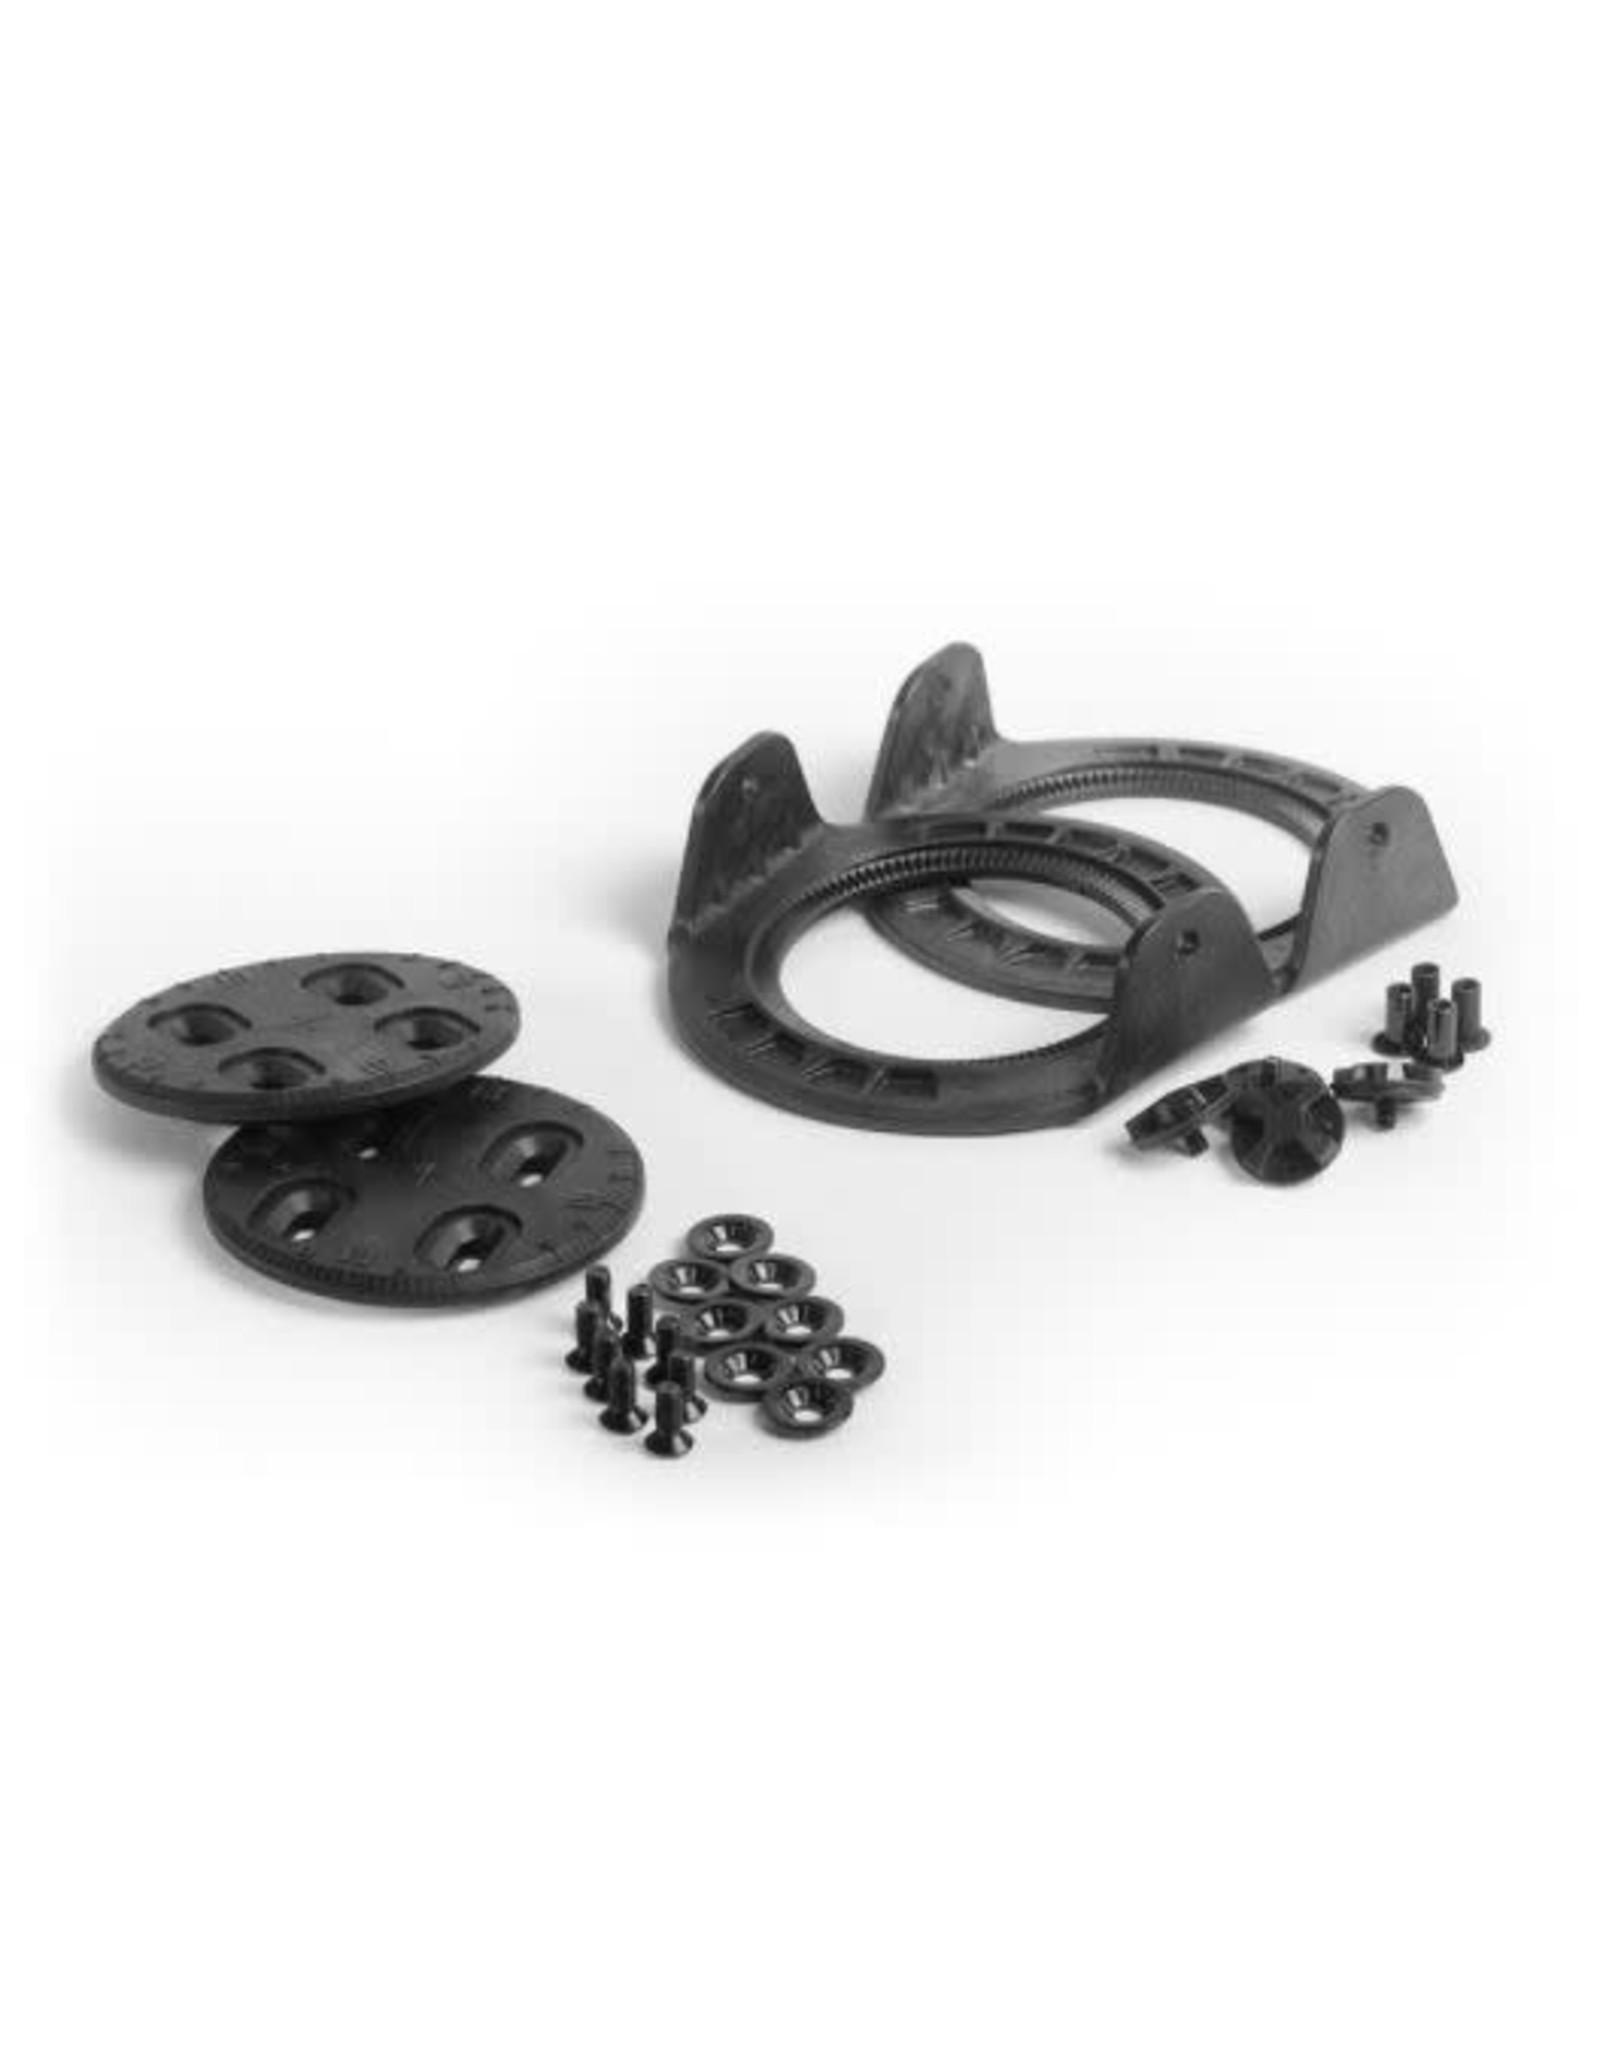 Now Now - King Pin tool less kit nylon black